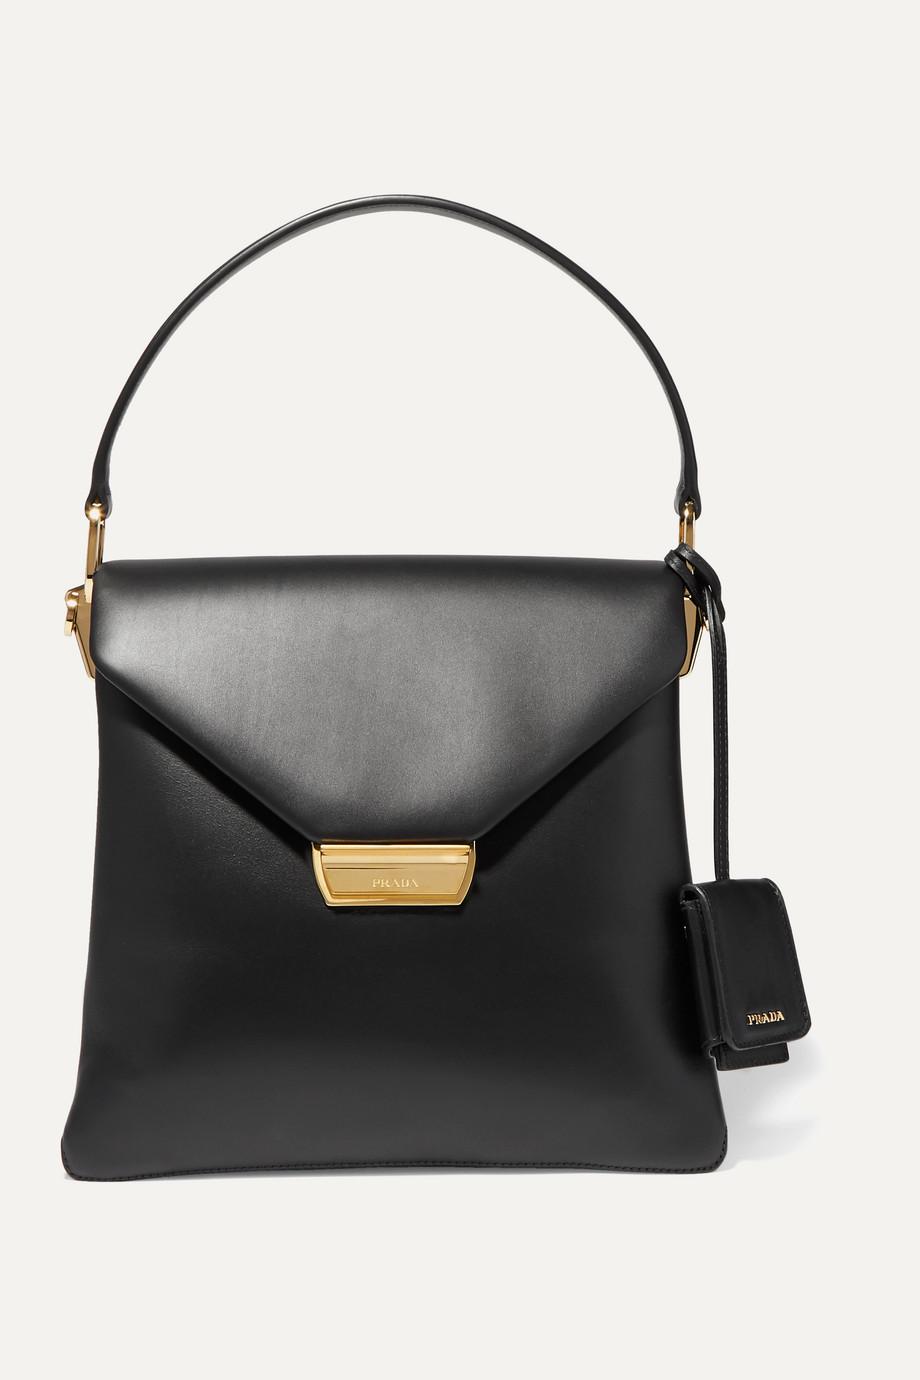 Prada Ingrid large leather tote